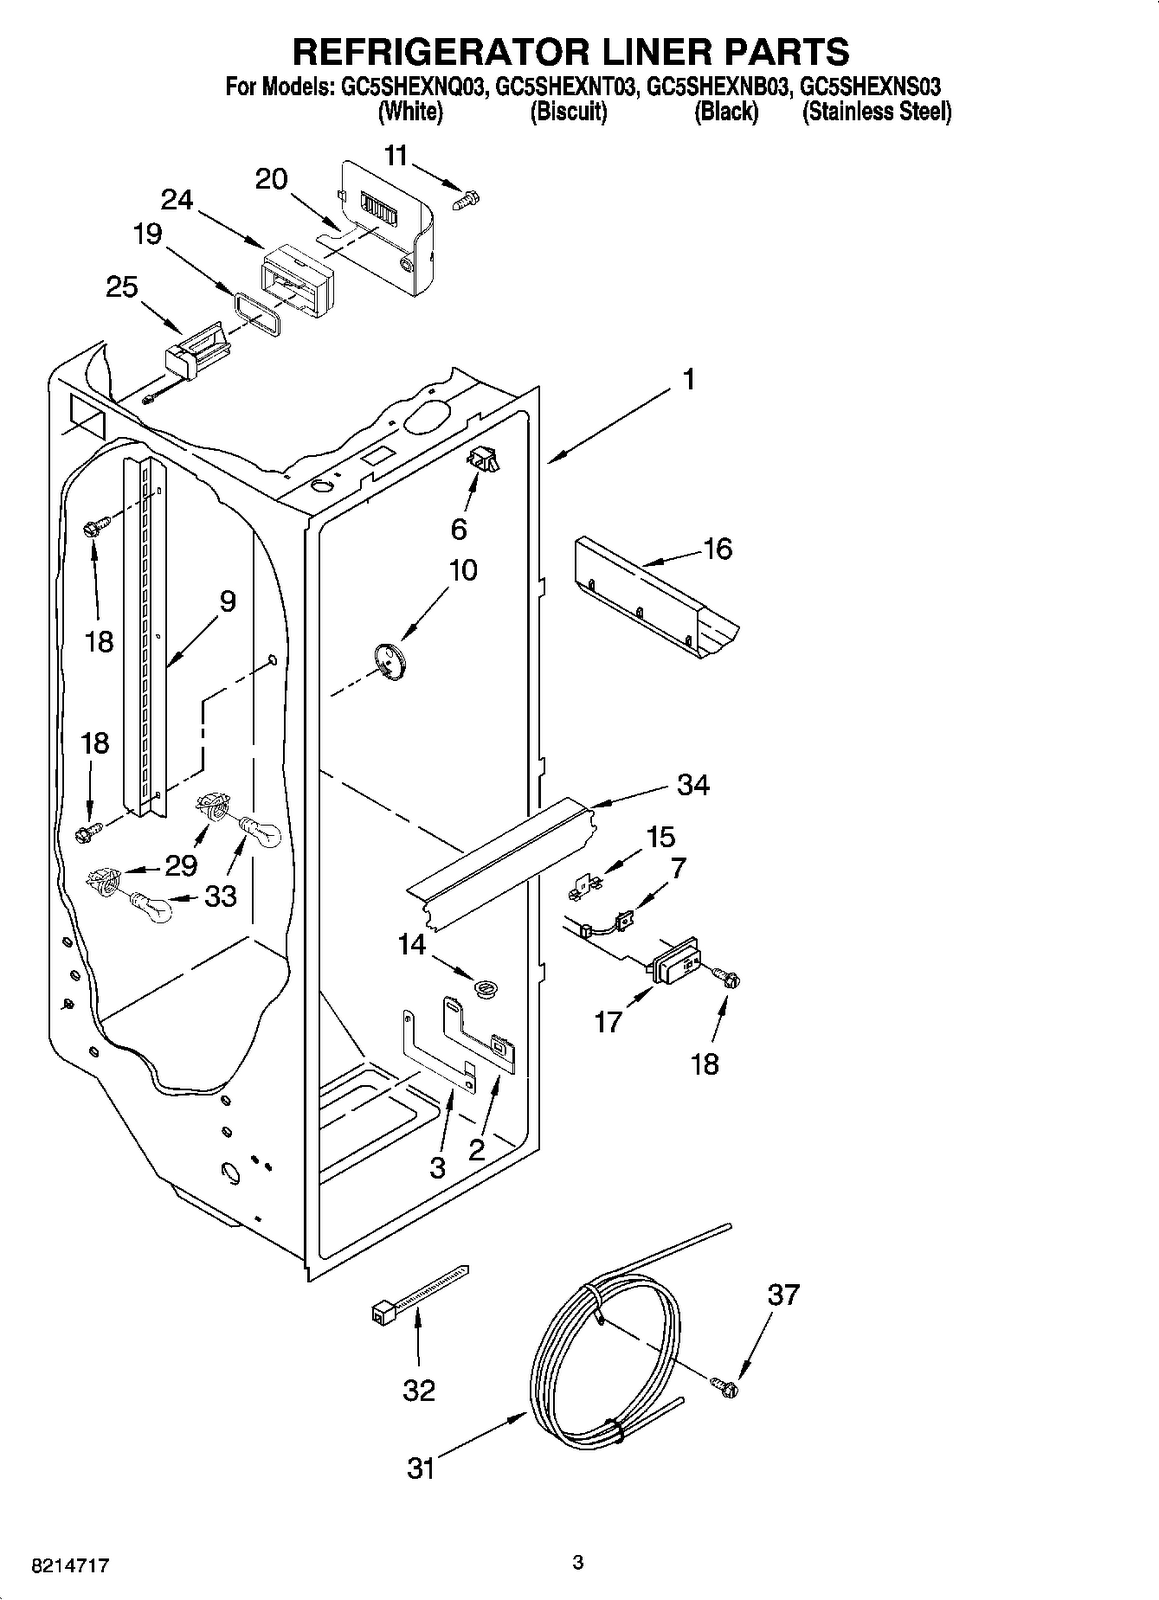 LED ELECTRONICS USA: GC5SHEXNS03 Refrigerator Compartment